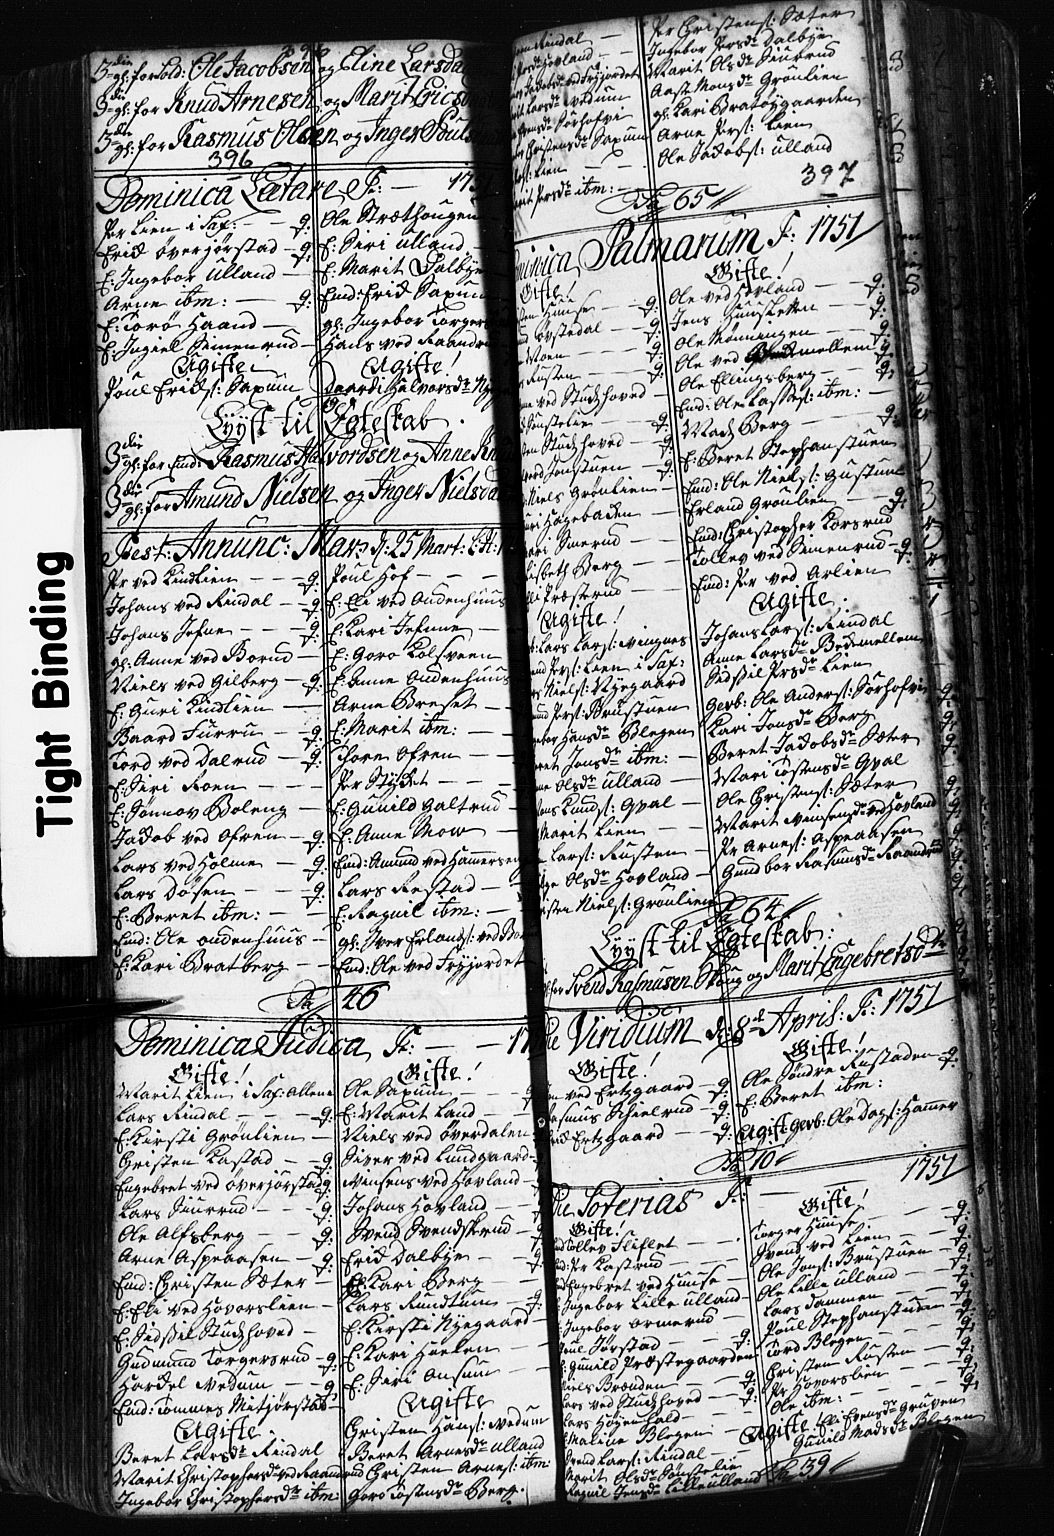 SAH, Fåberg prestekontor, Klokkerbok nr. 2, 1741-1756, s. 396-397